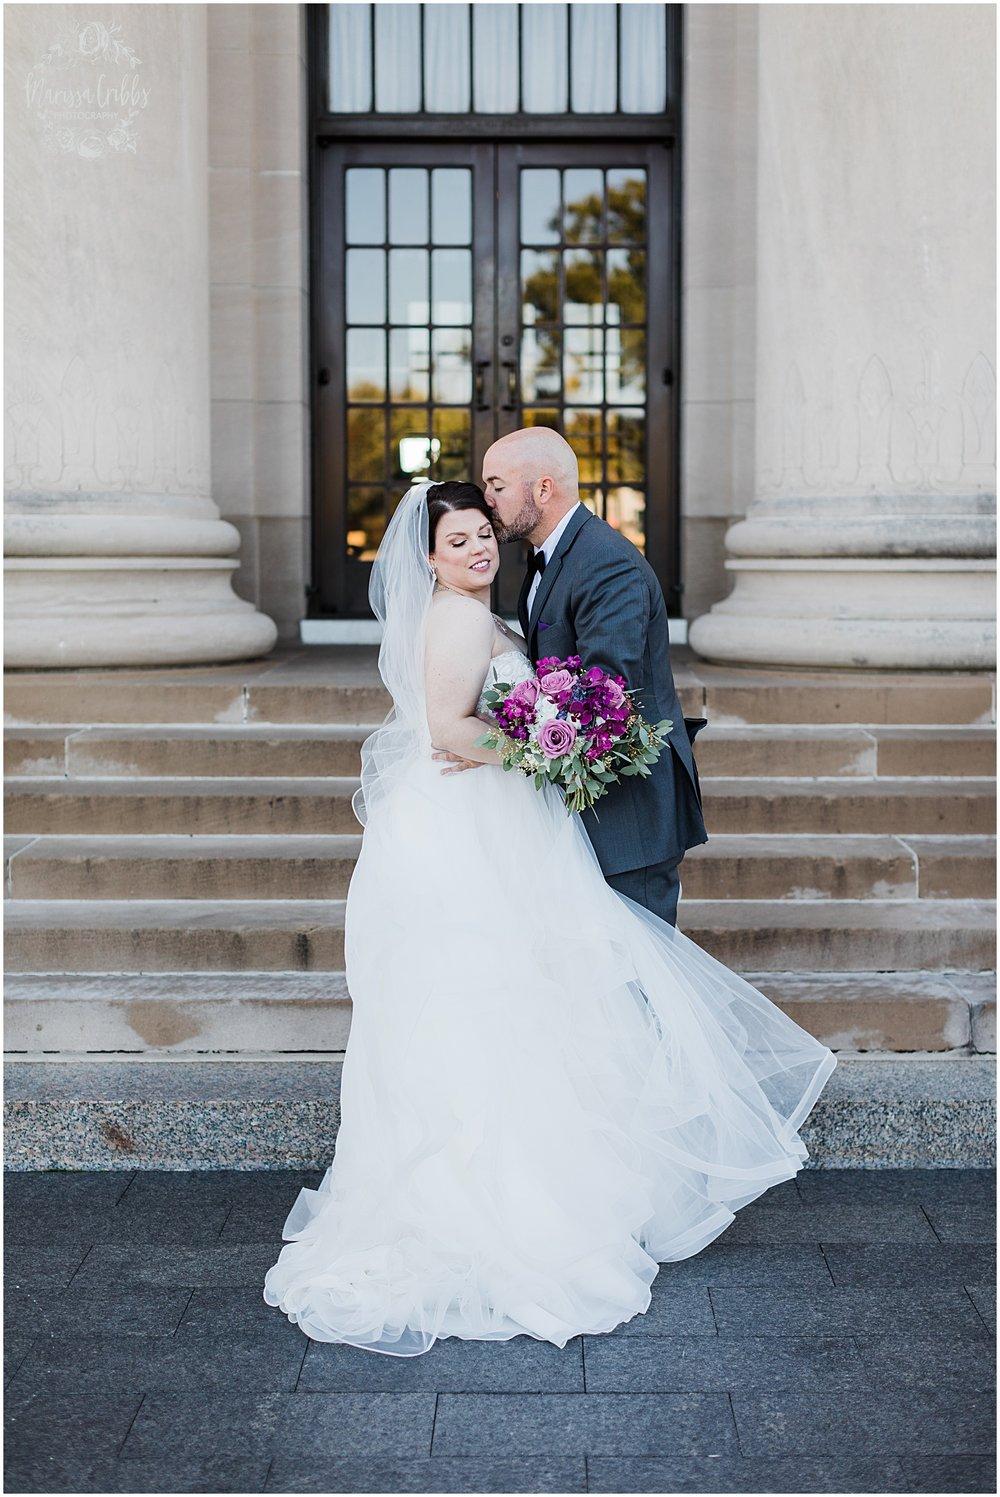 LAURA & DAN MARRIED | NELSON ATKINS MUSEUM | MARISSA CRIBBS PHOTOGRAPHY_7001.jpg